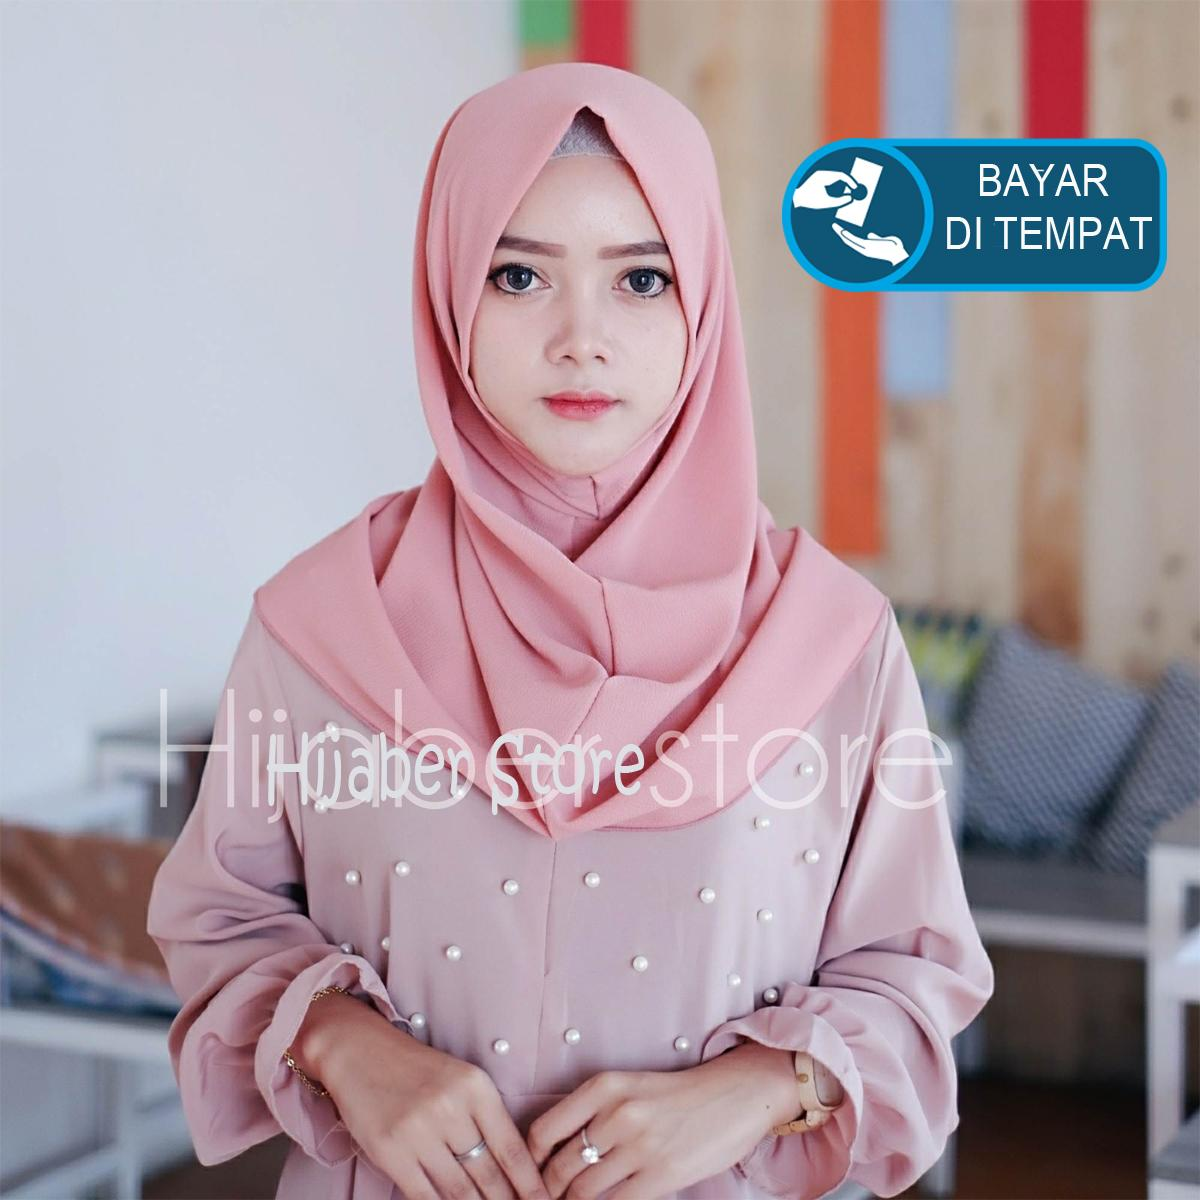 Jual Hijab Jilbab Modern Terbaik Instan Simple Pet Promo Shalwa Kerudung Salwa Bahan Bubble Premium